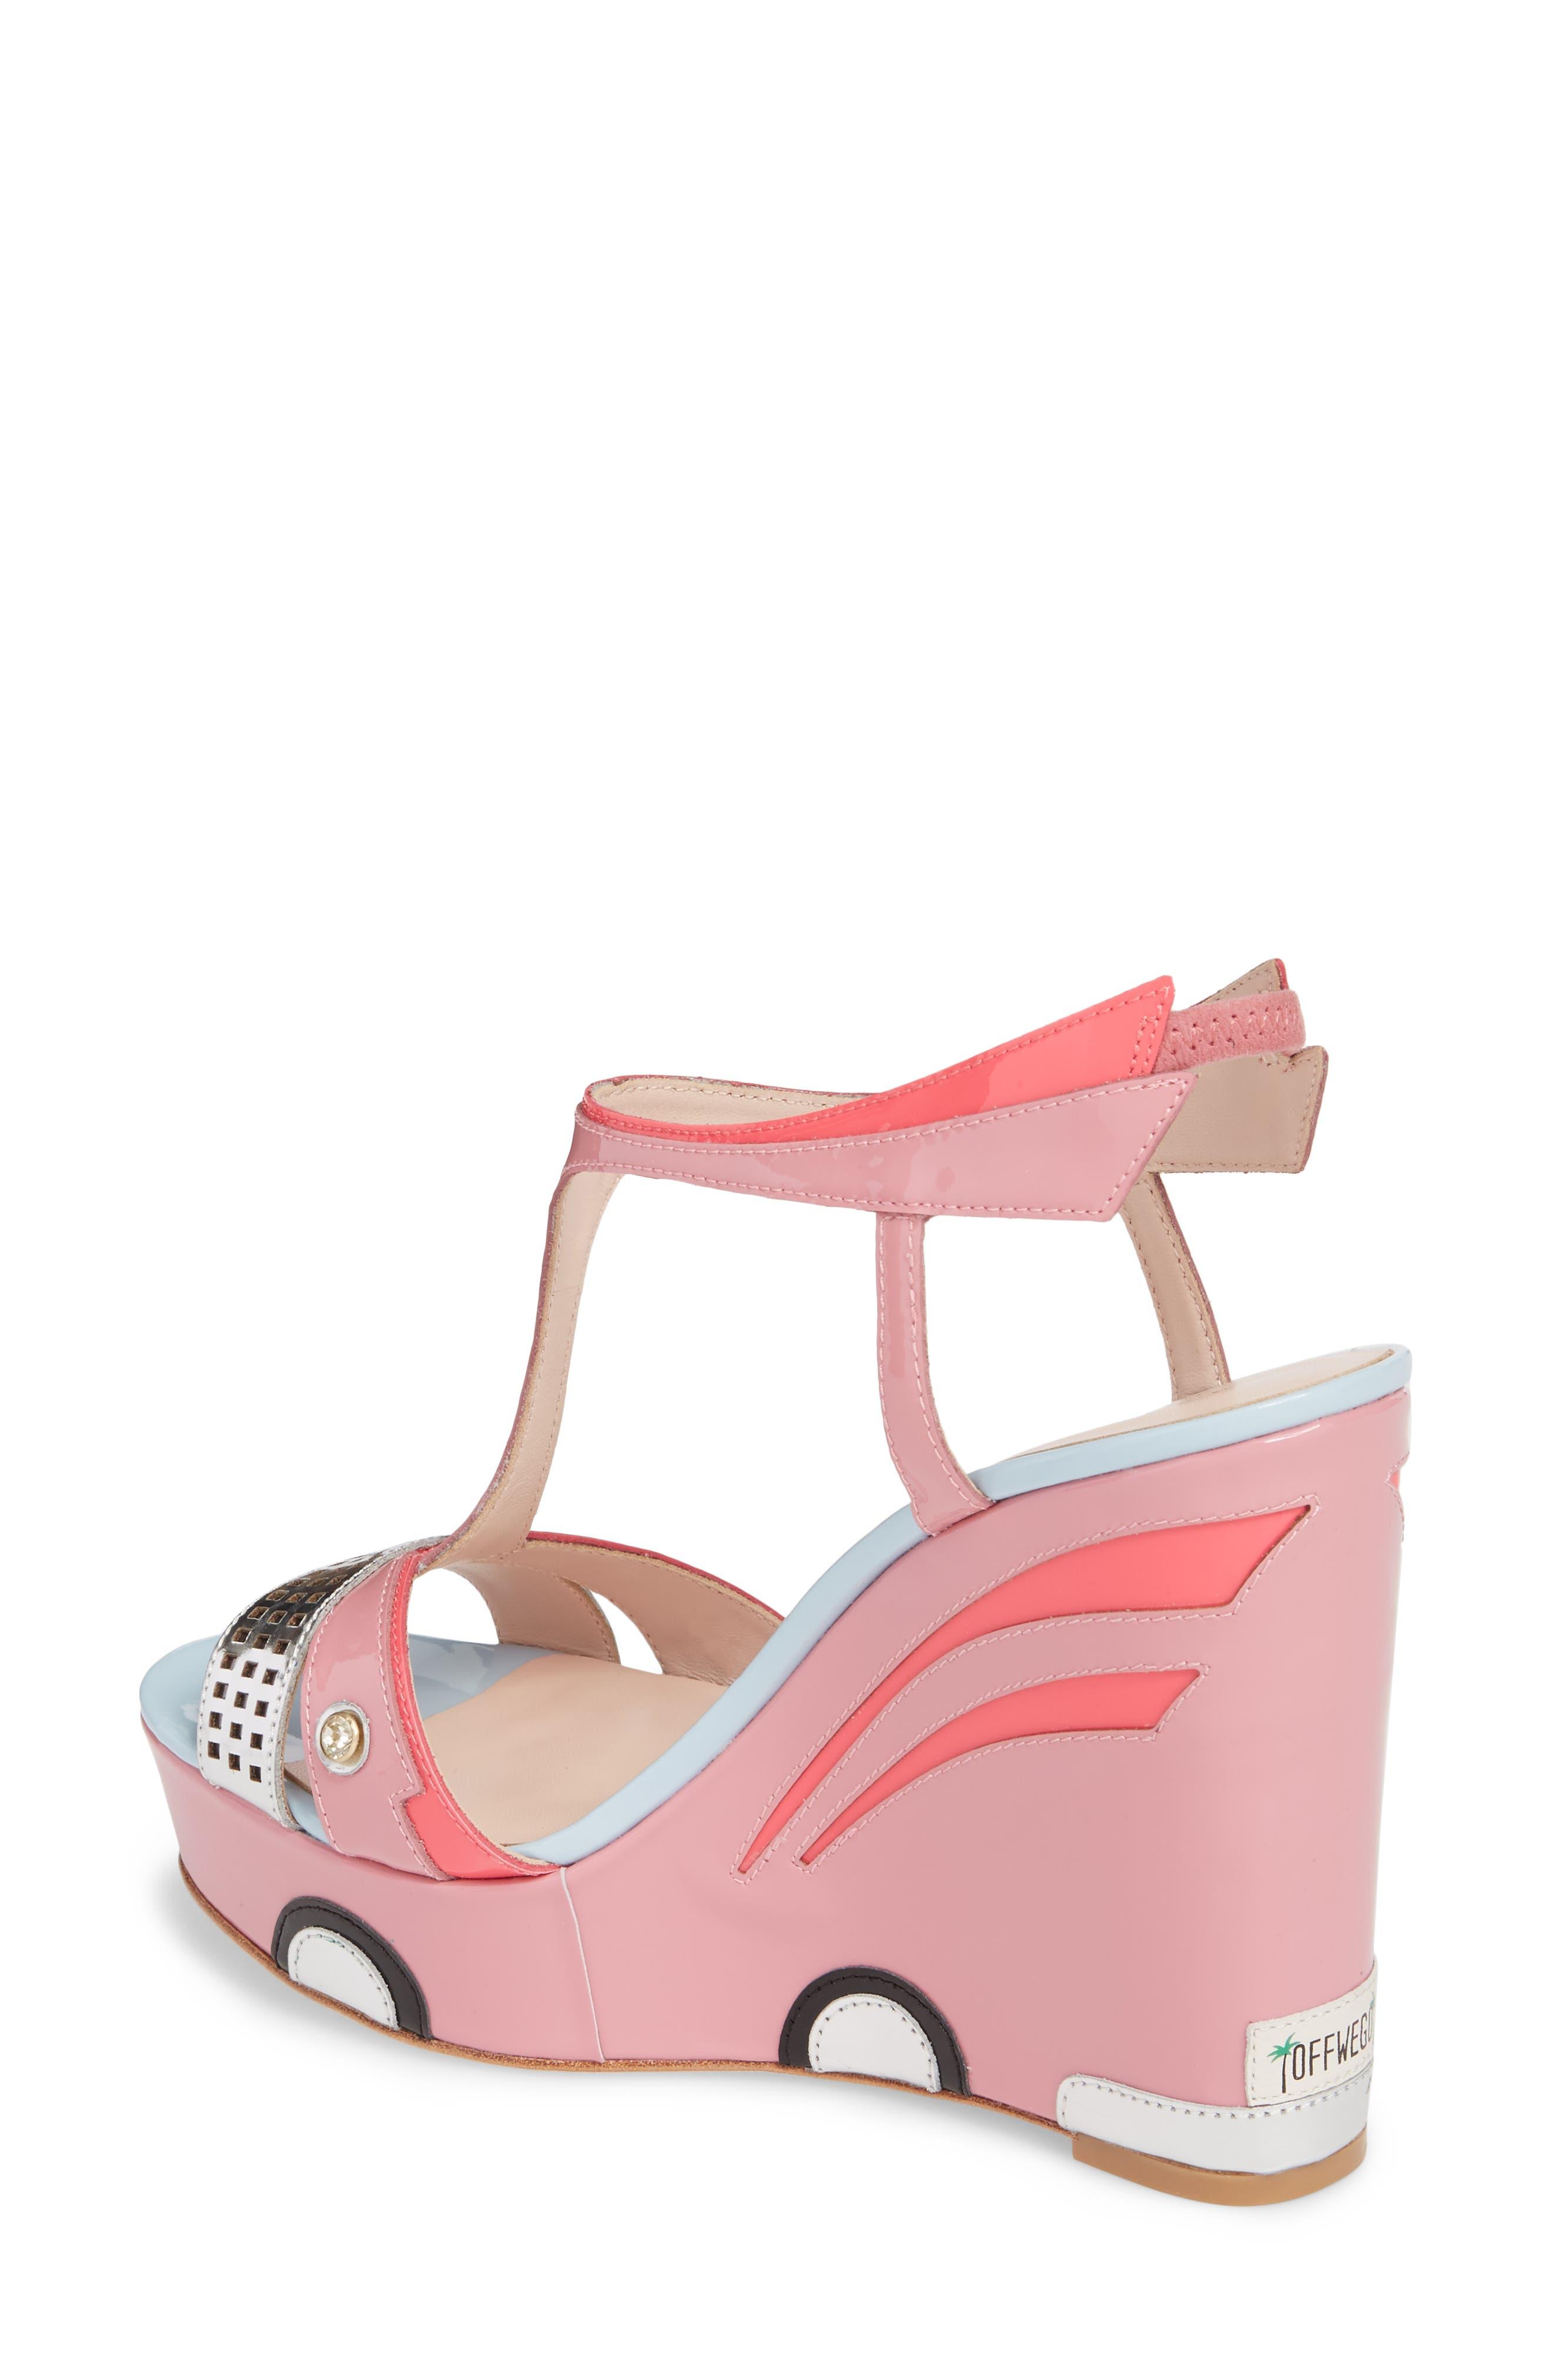 deanna wedge t-strap sandal,                             Alternate thumbnail 2, color,                             Petunia Patent